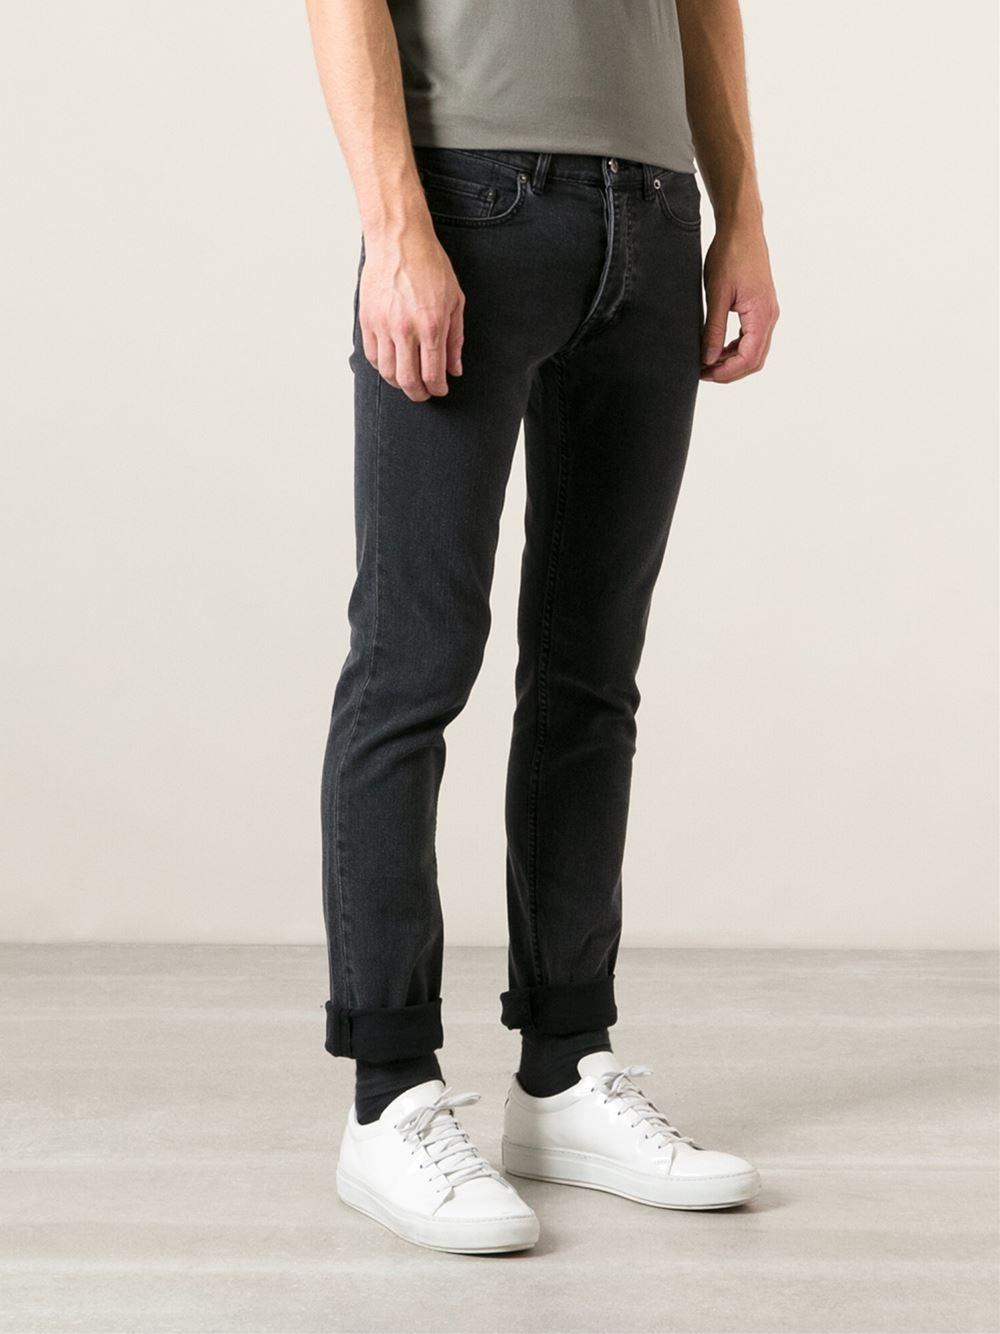 Lyst - Acne Studios Straight Leg Jeans in Black for Men 644bf21f5ec